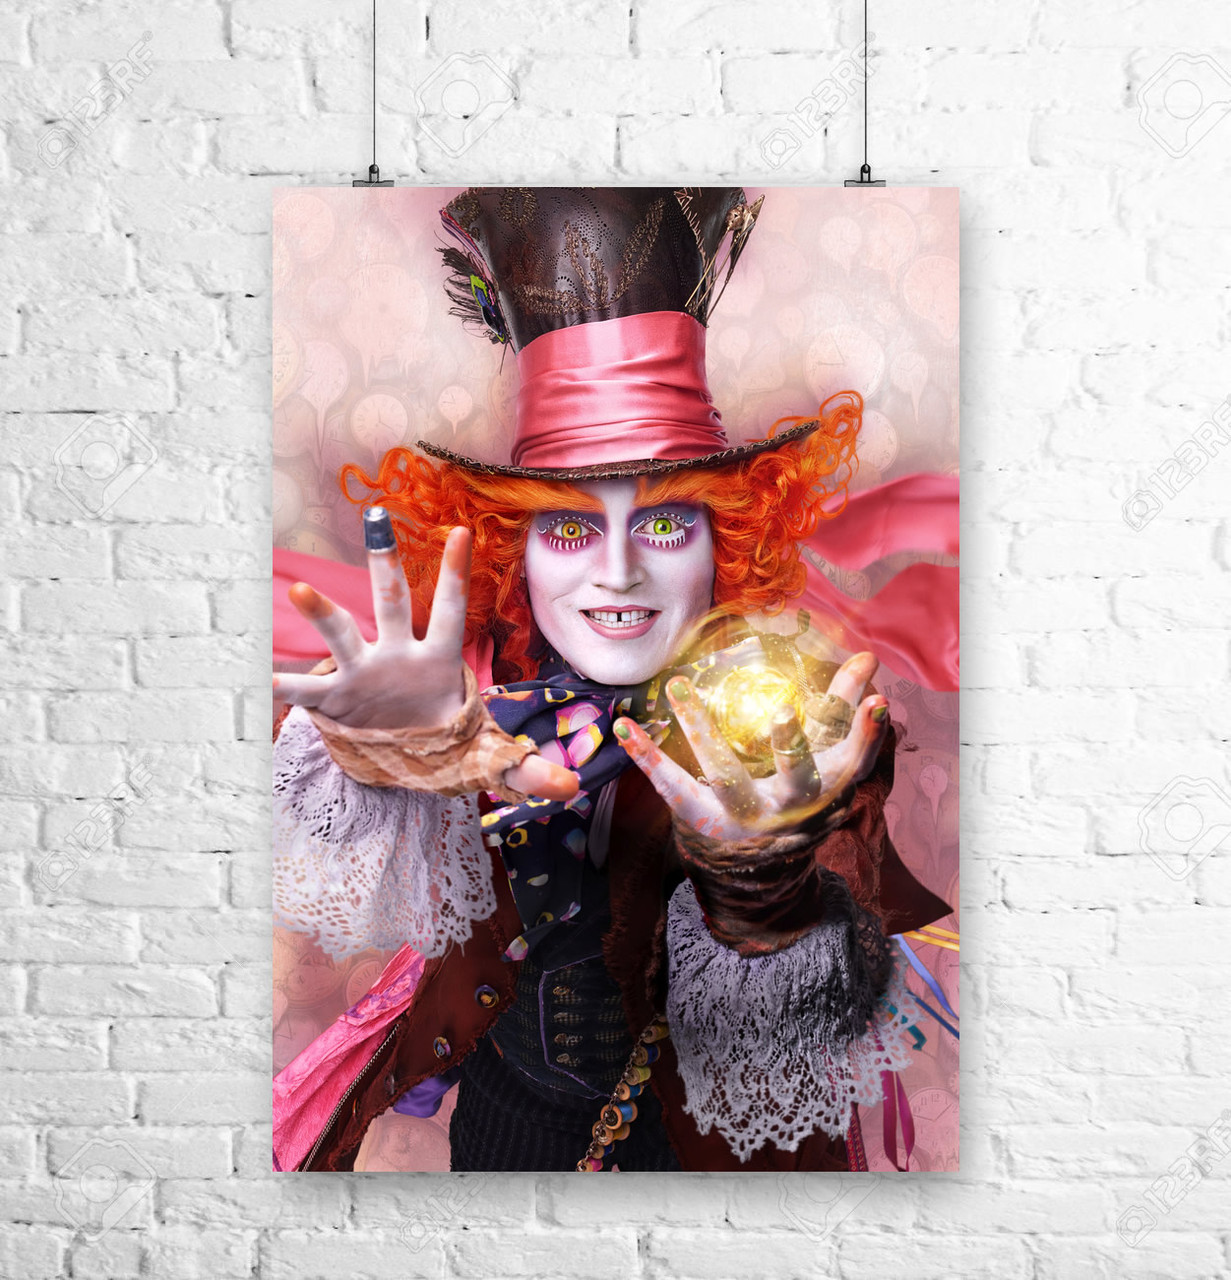 Постер Шляпник. Алиса в Стране Чудес, Alice in Wonderland. Размер 60x42см (A2). Глянцевая бумага